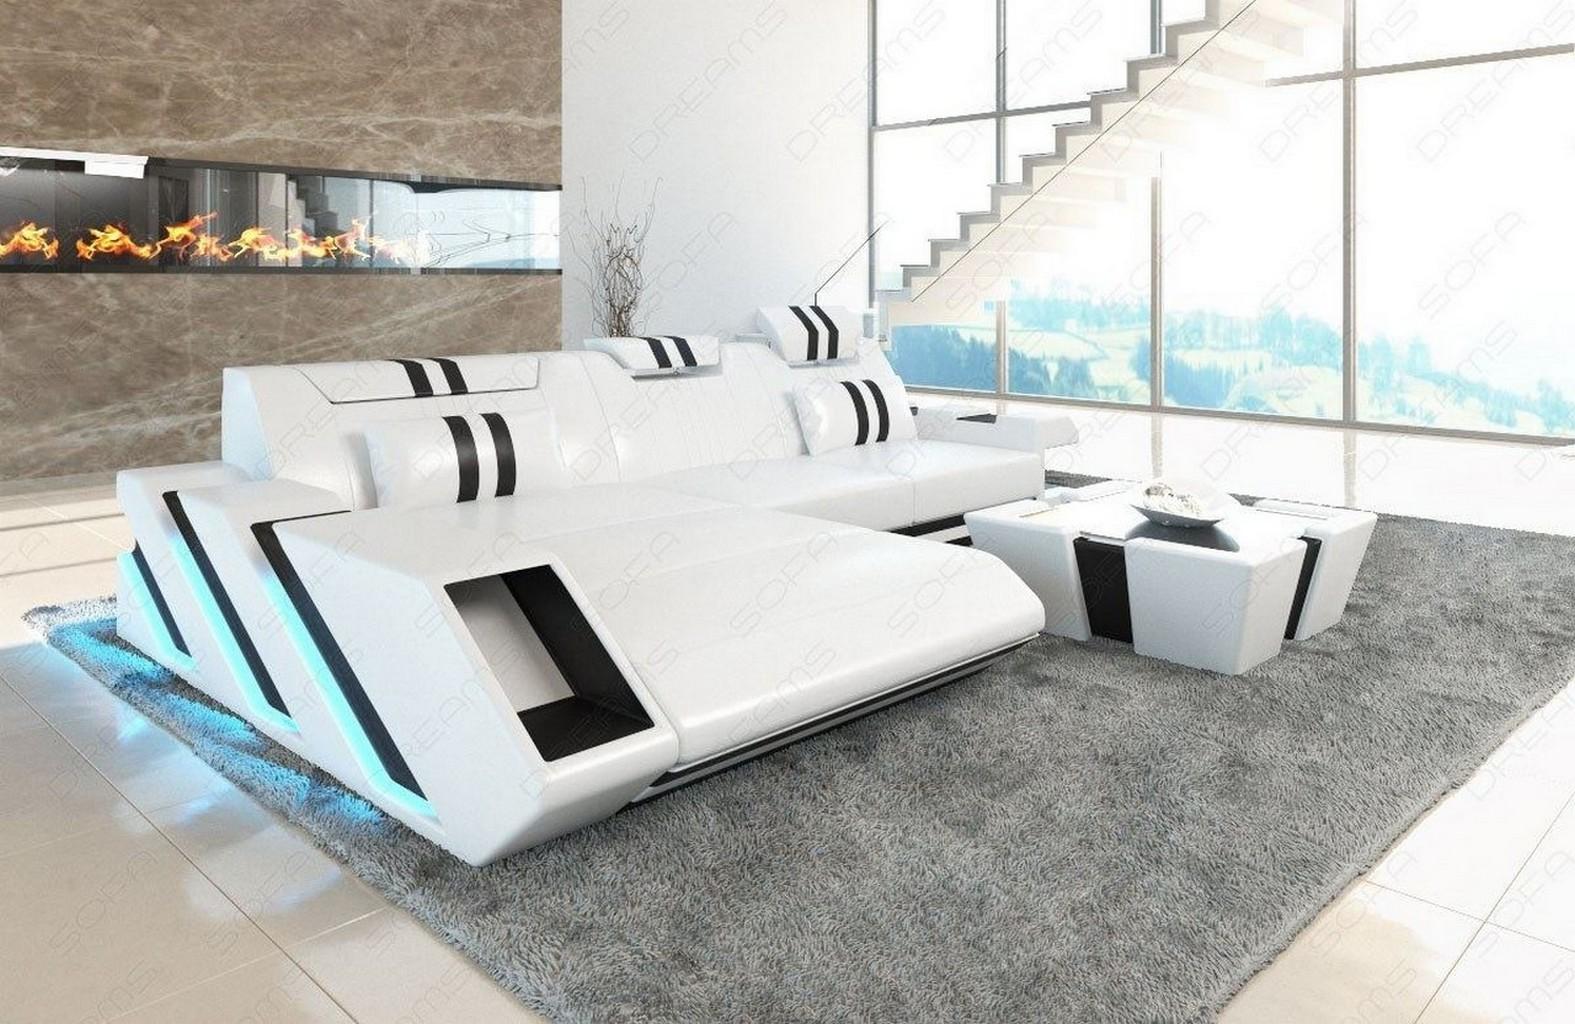 Ledersofa wohnlandschaft xxl ecksofa bigsofa design couch for Wohnlandschaft bis 3m